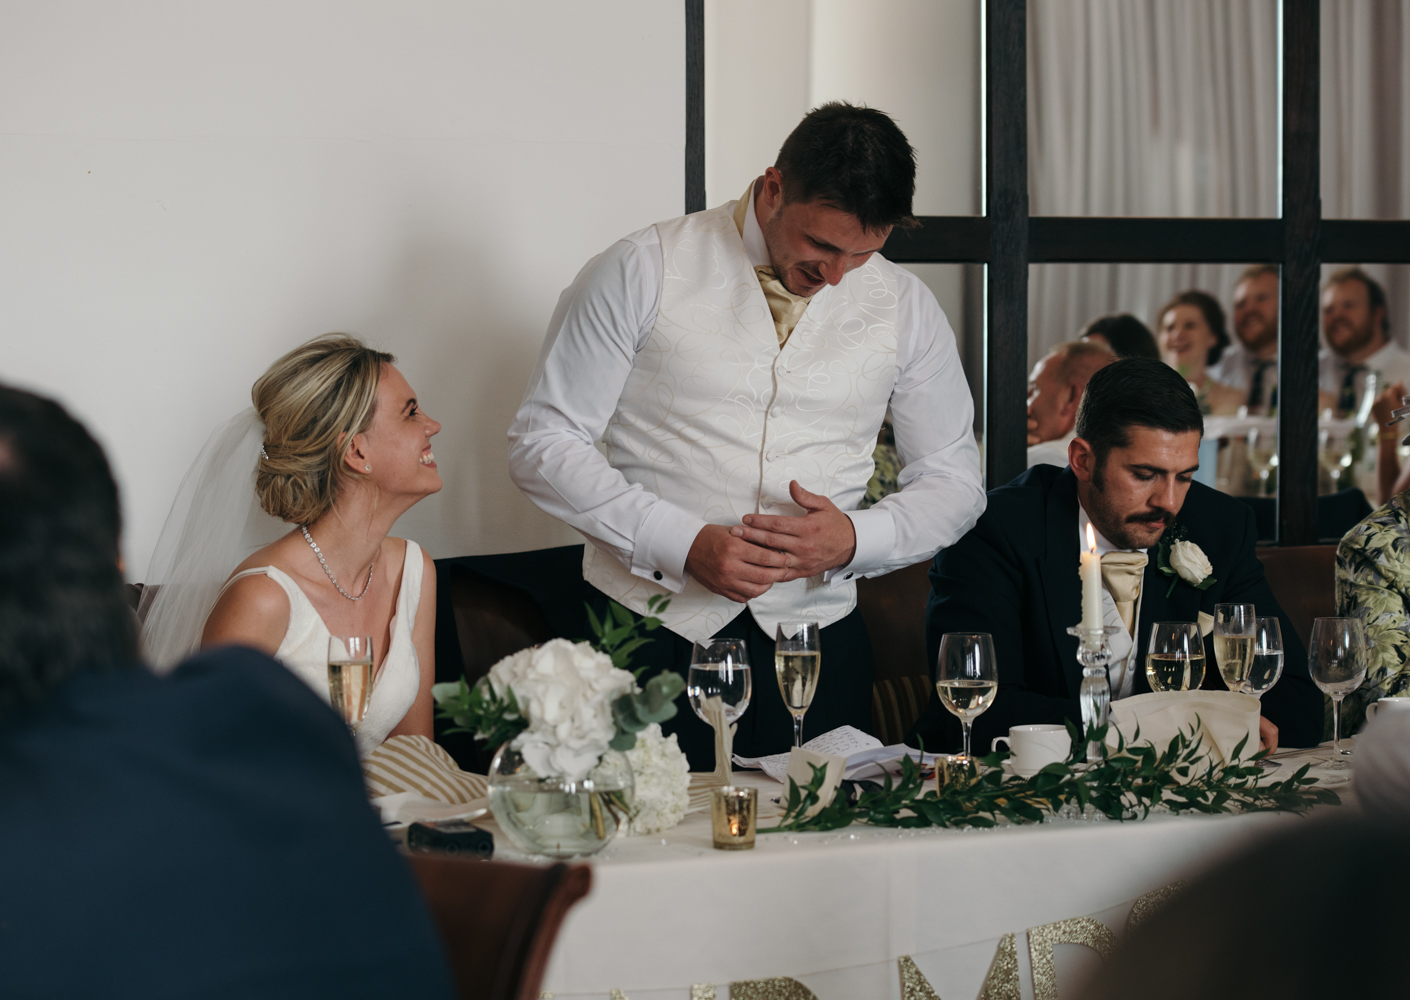 The groom making his speech